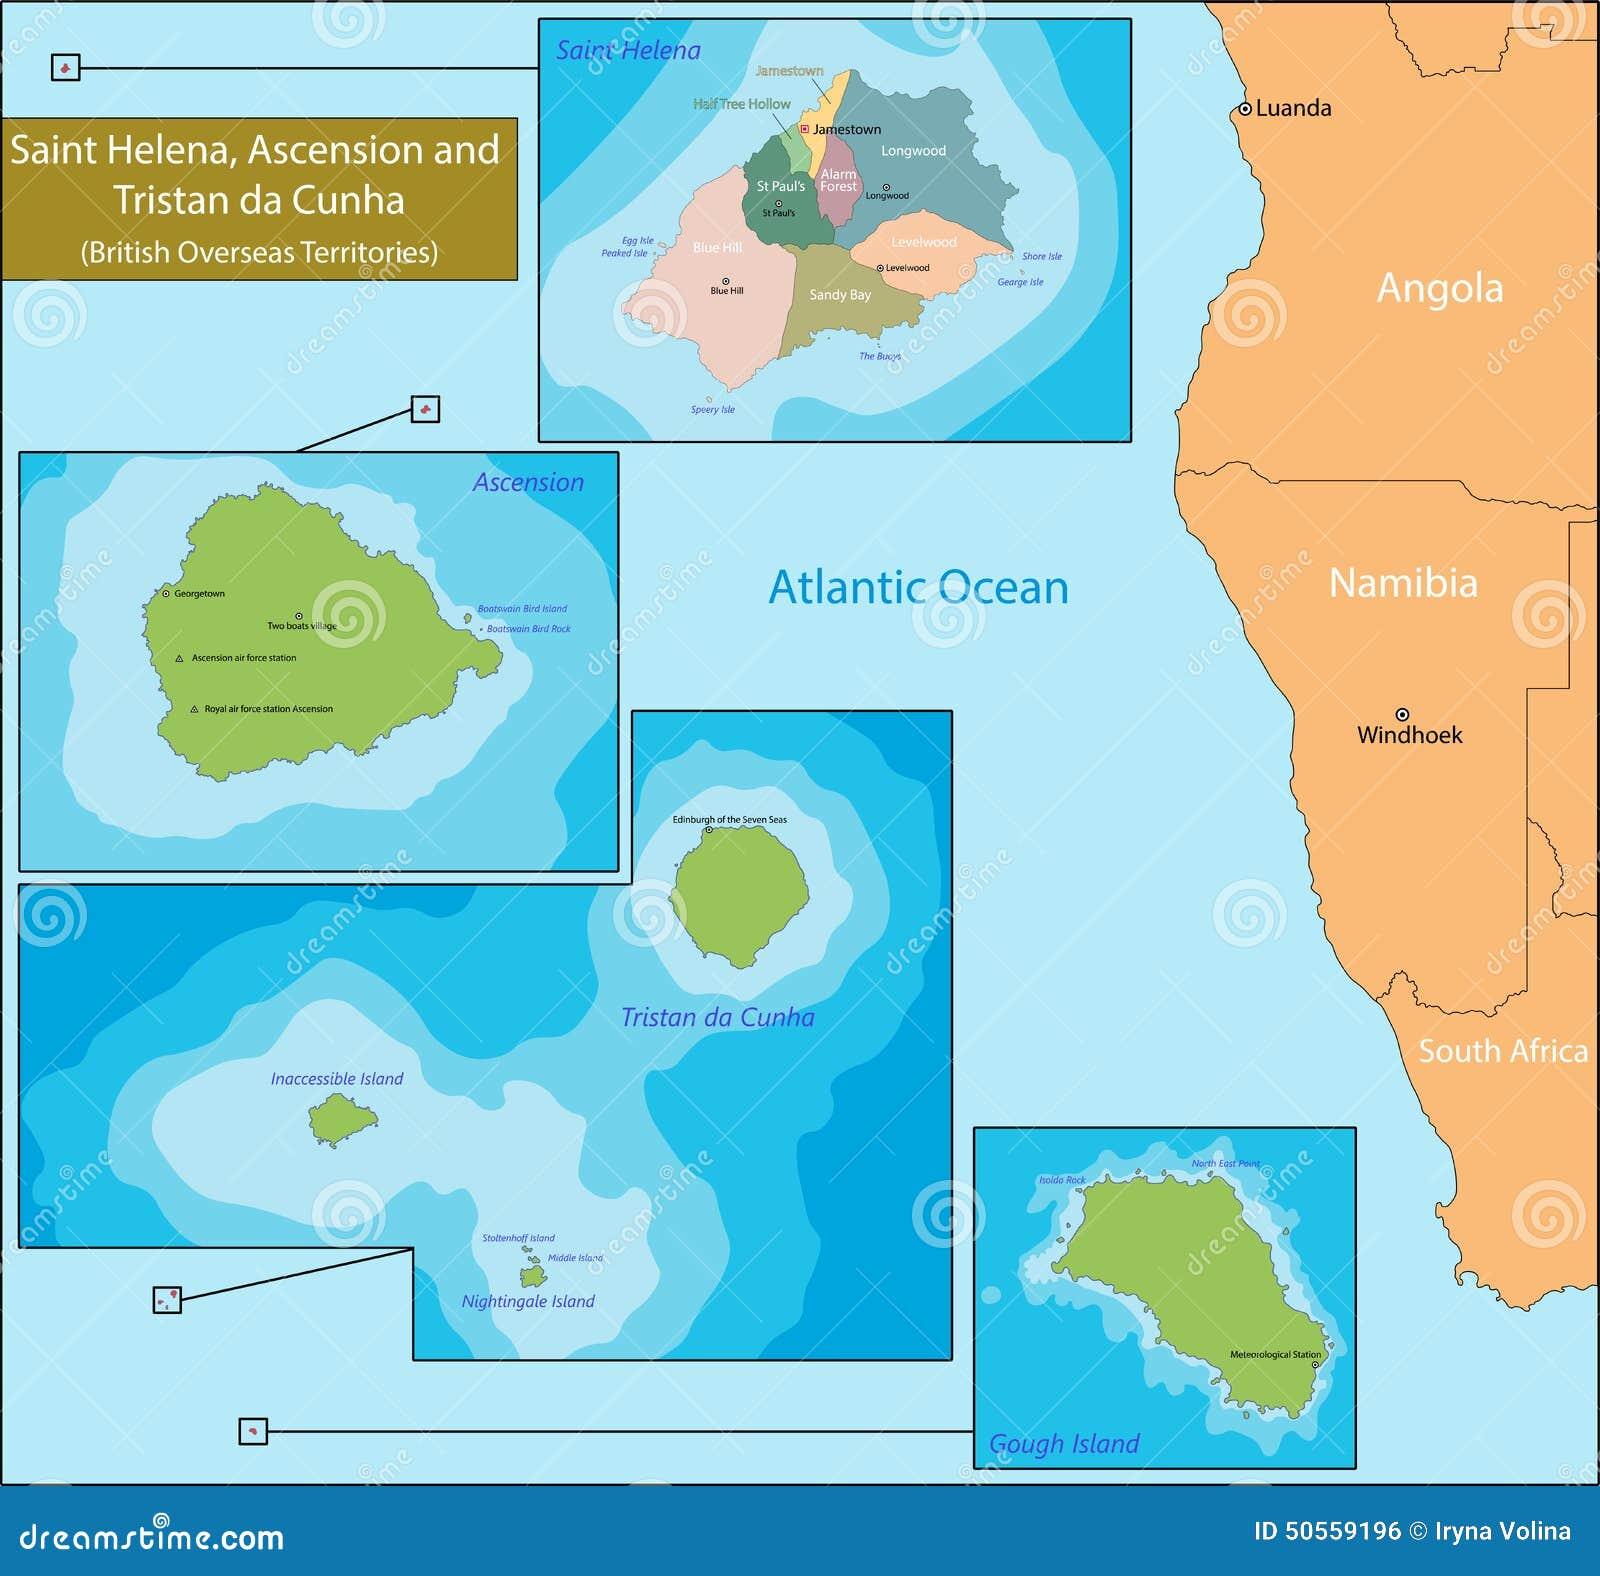 Saint Helena, Ascension And Tristan Da Cunha Map Stock ... on st. johns river fishing map, dominican republic map, saint jerome map, tokelau map, south helena map, saint colorado springs map, seychelles map, helena street map, madeira map, reunion map, mayotte map, cape verde map, samoa map, senegal map, tensas map, st. helena california map, saint michael map, mozambique map, nauru map, tuvalu map,